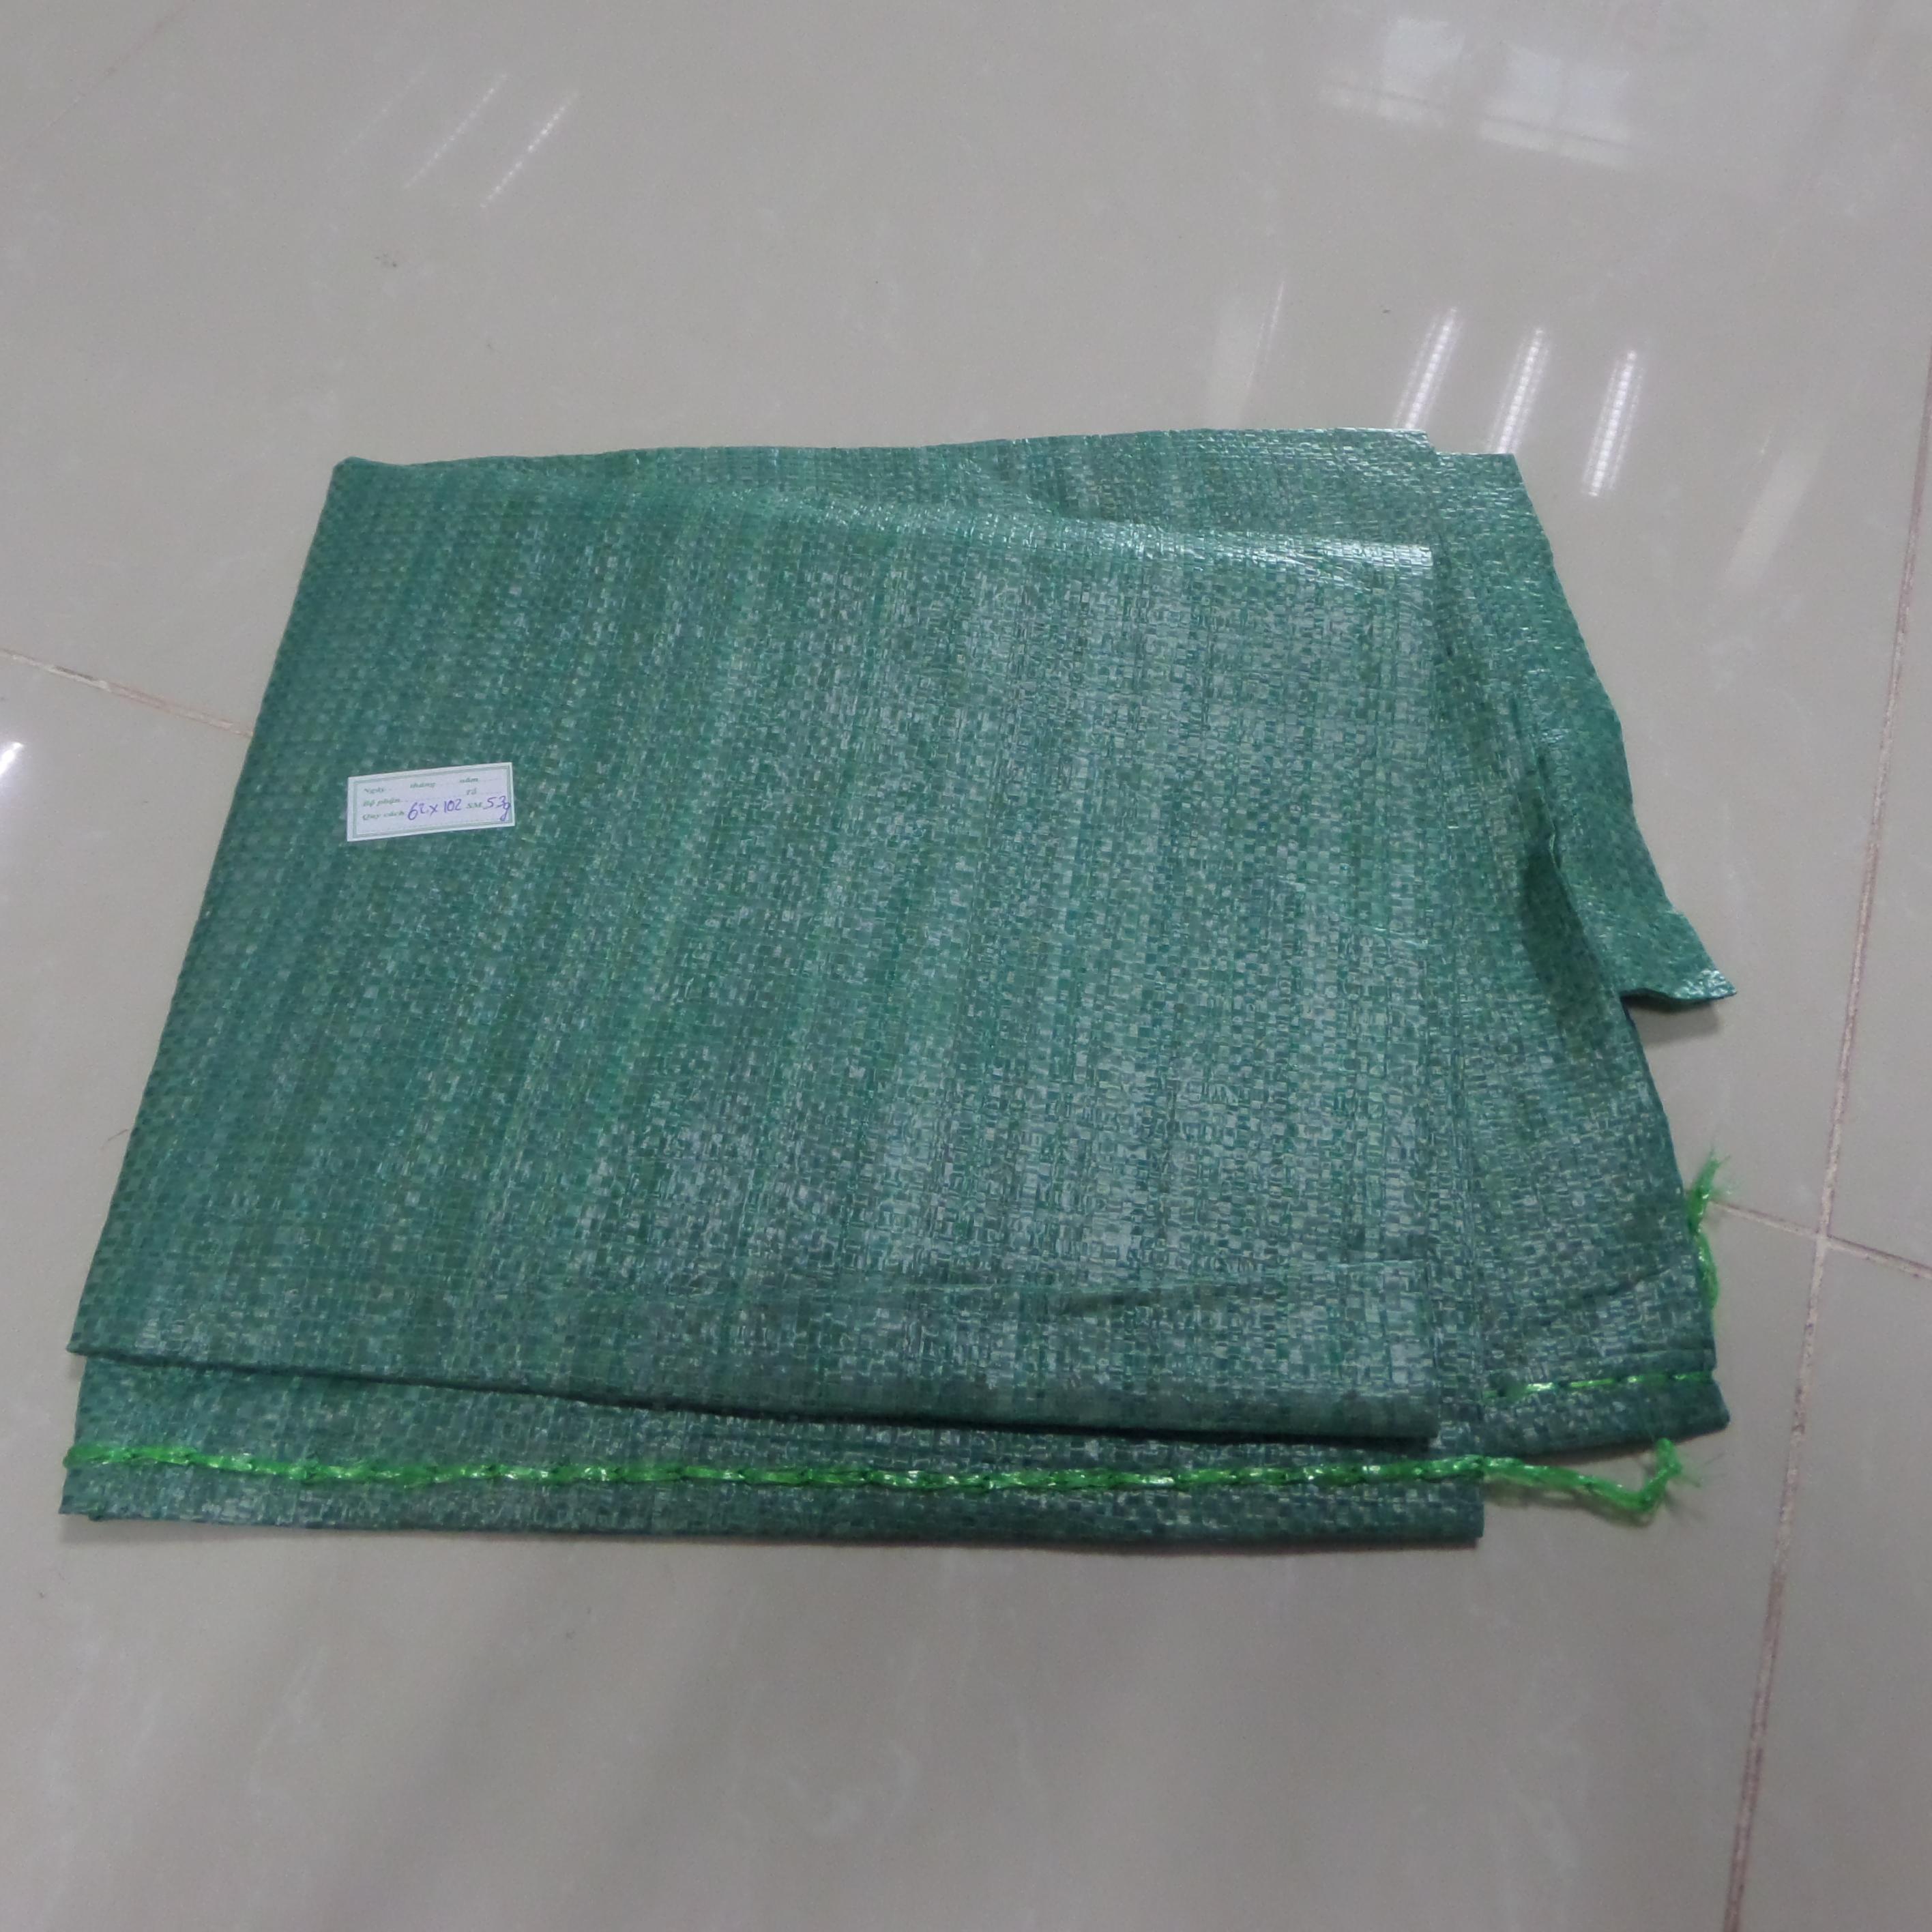 Bao xanh cốm Kt 70 *120 / 53 (g/m2)